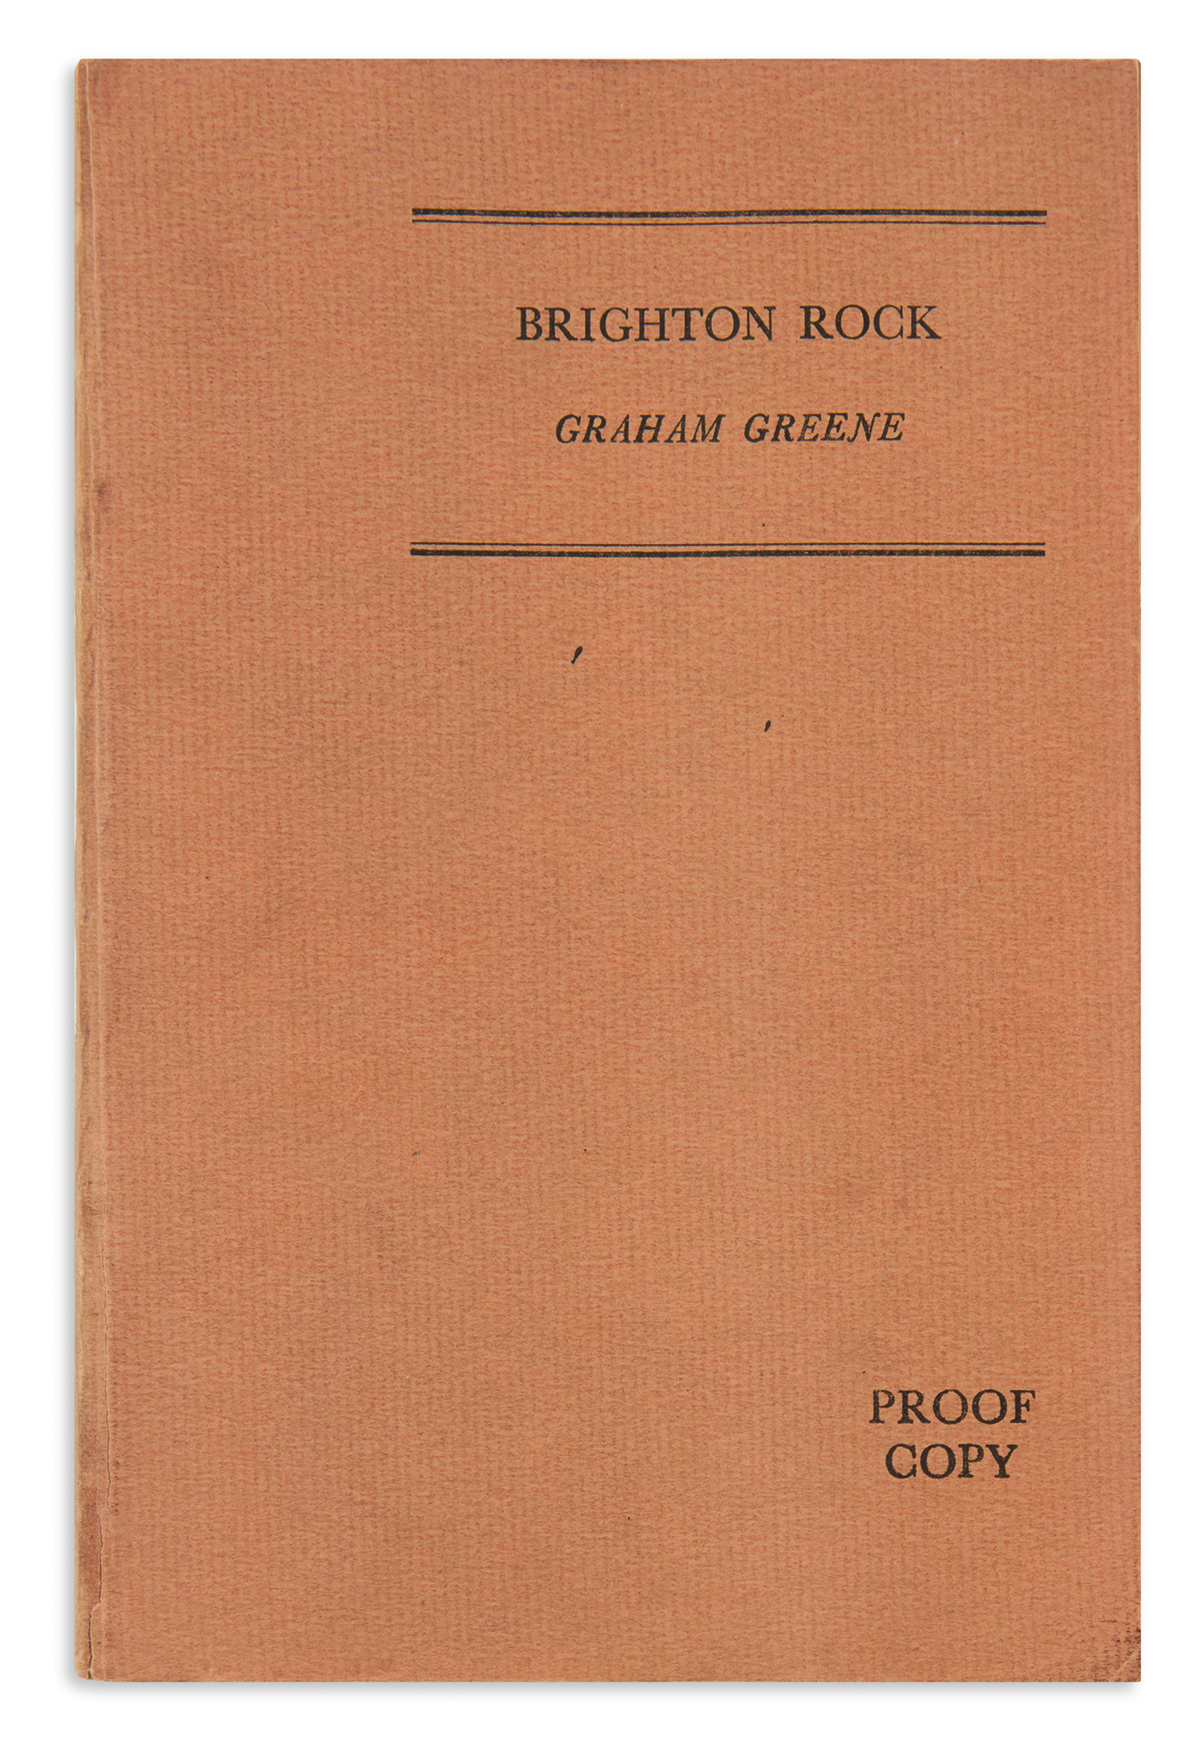 GREENE, GRAHAM. Brighton Rock.